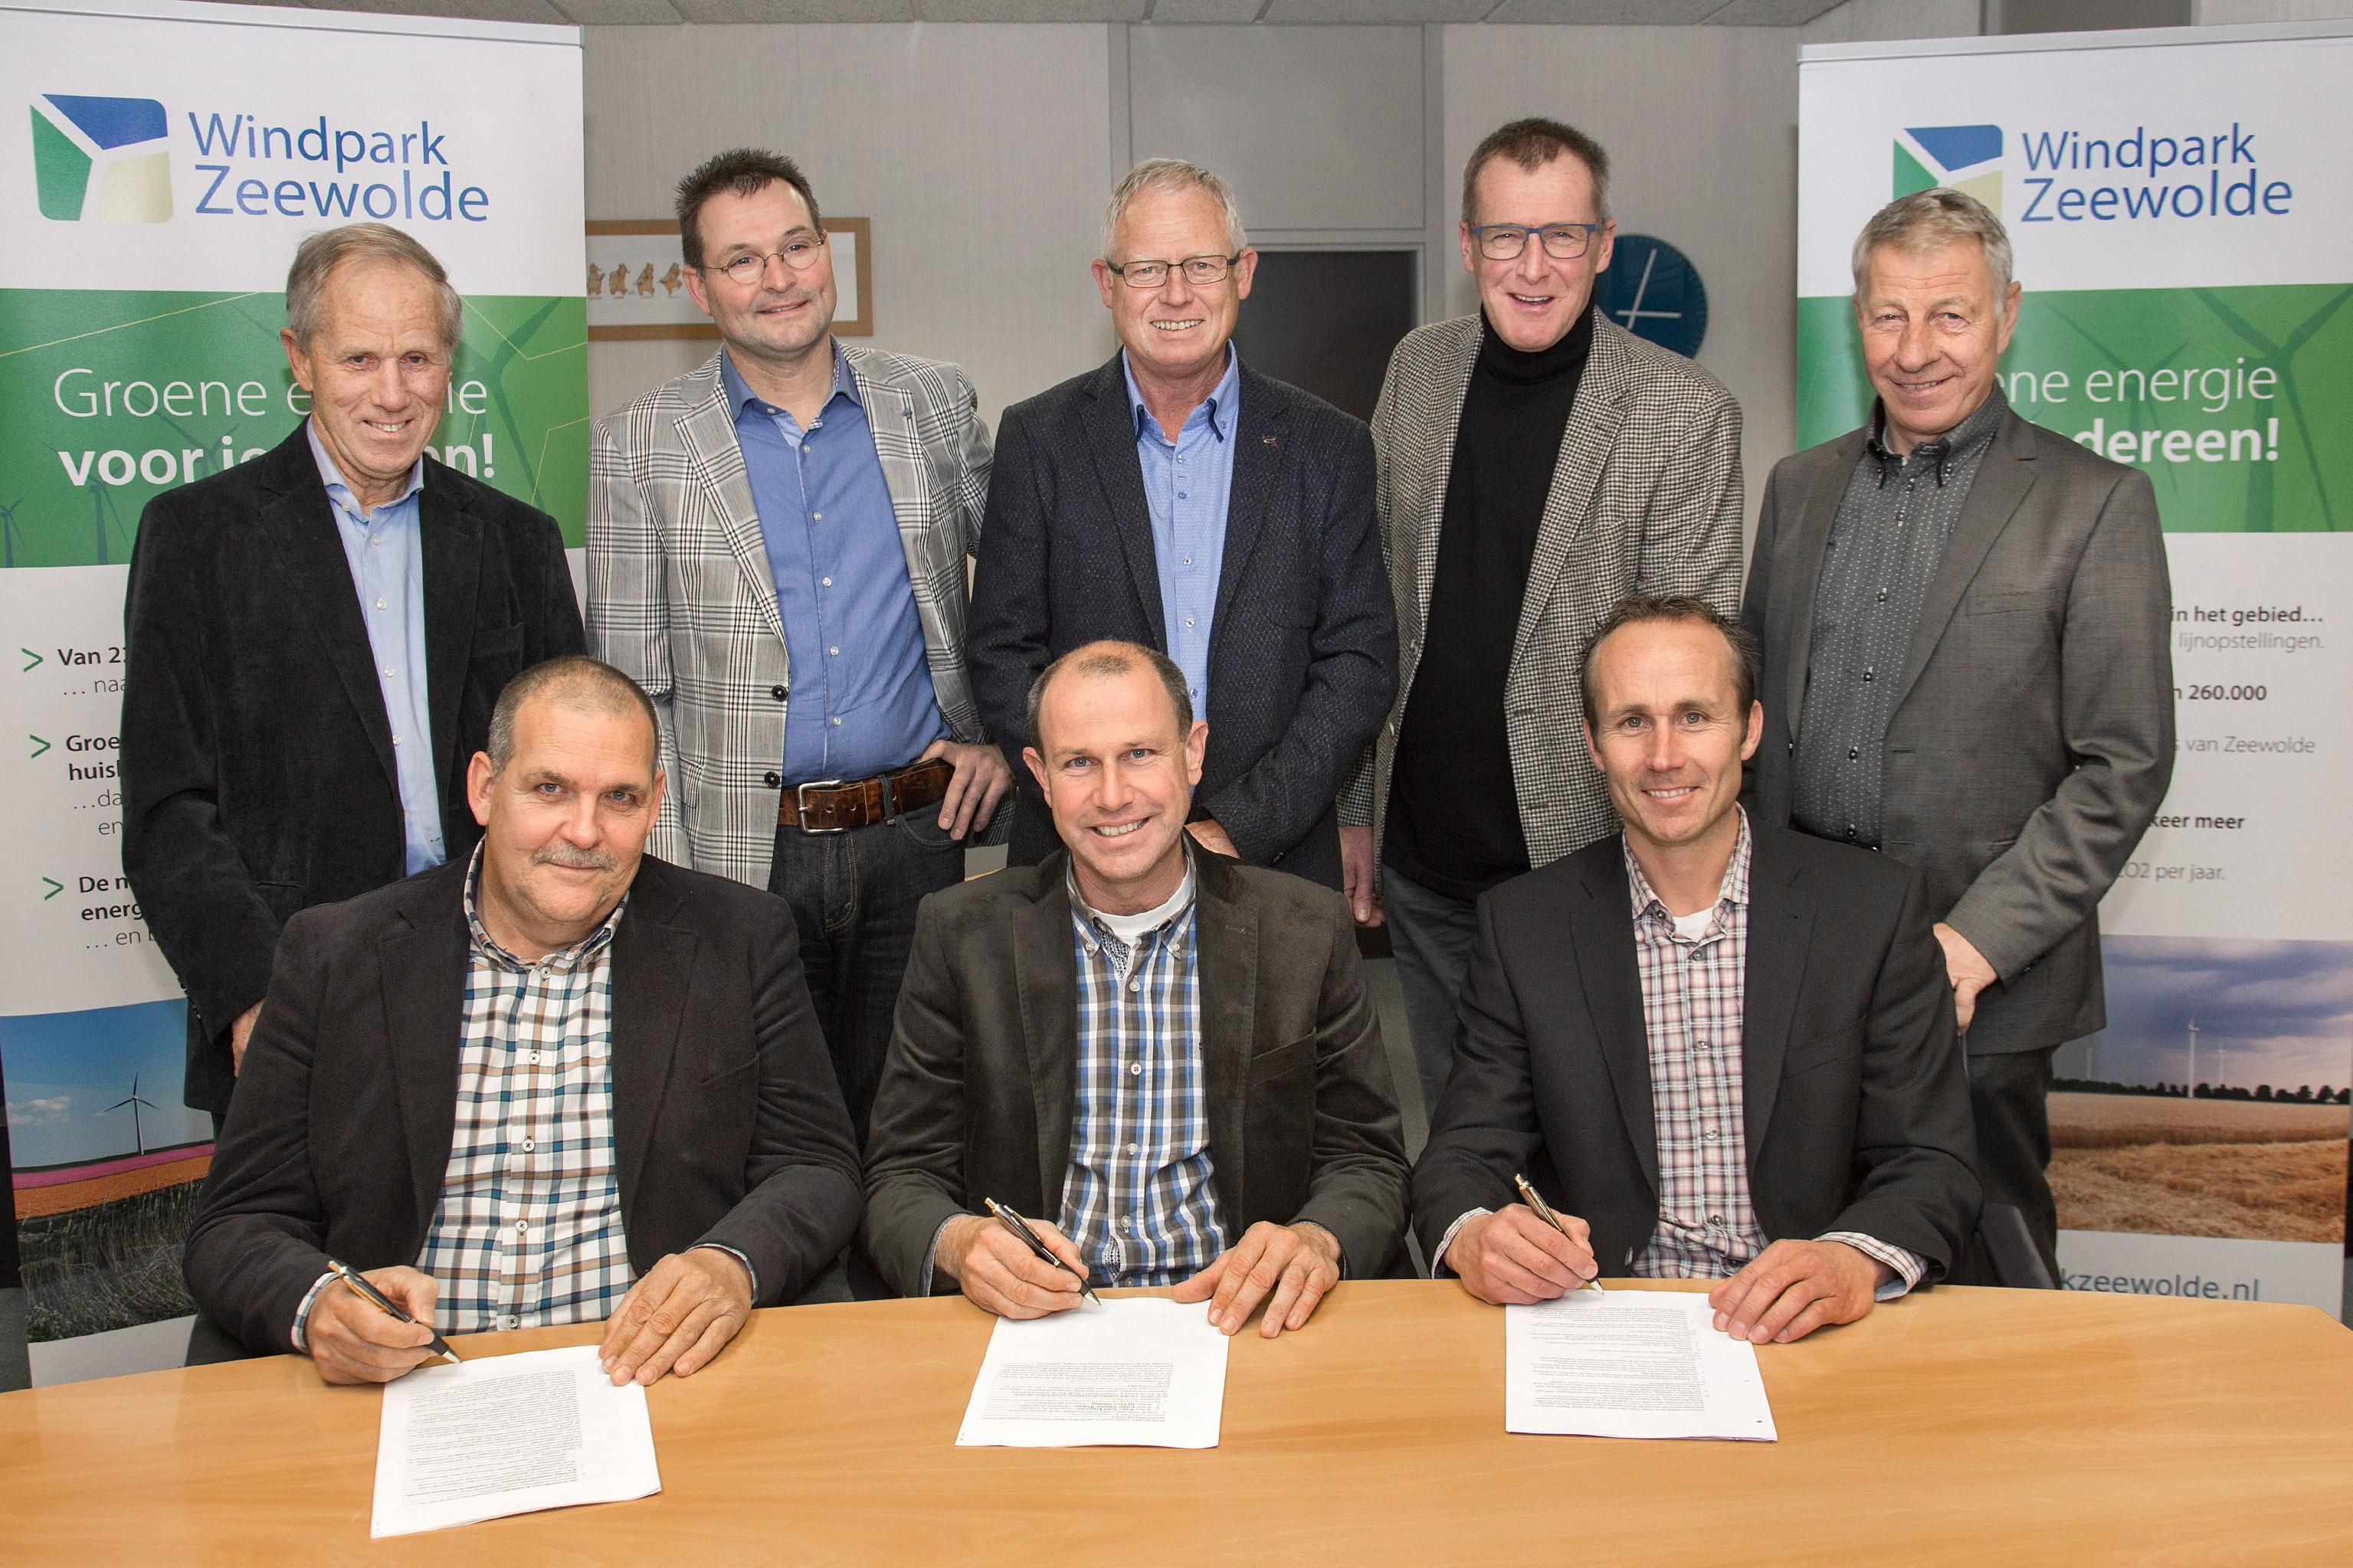 Foto Oprichting BV (c) Windpark Zeewolde